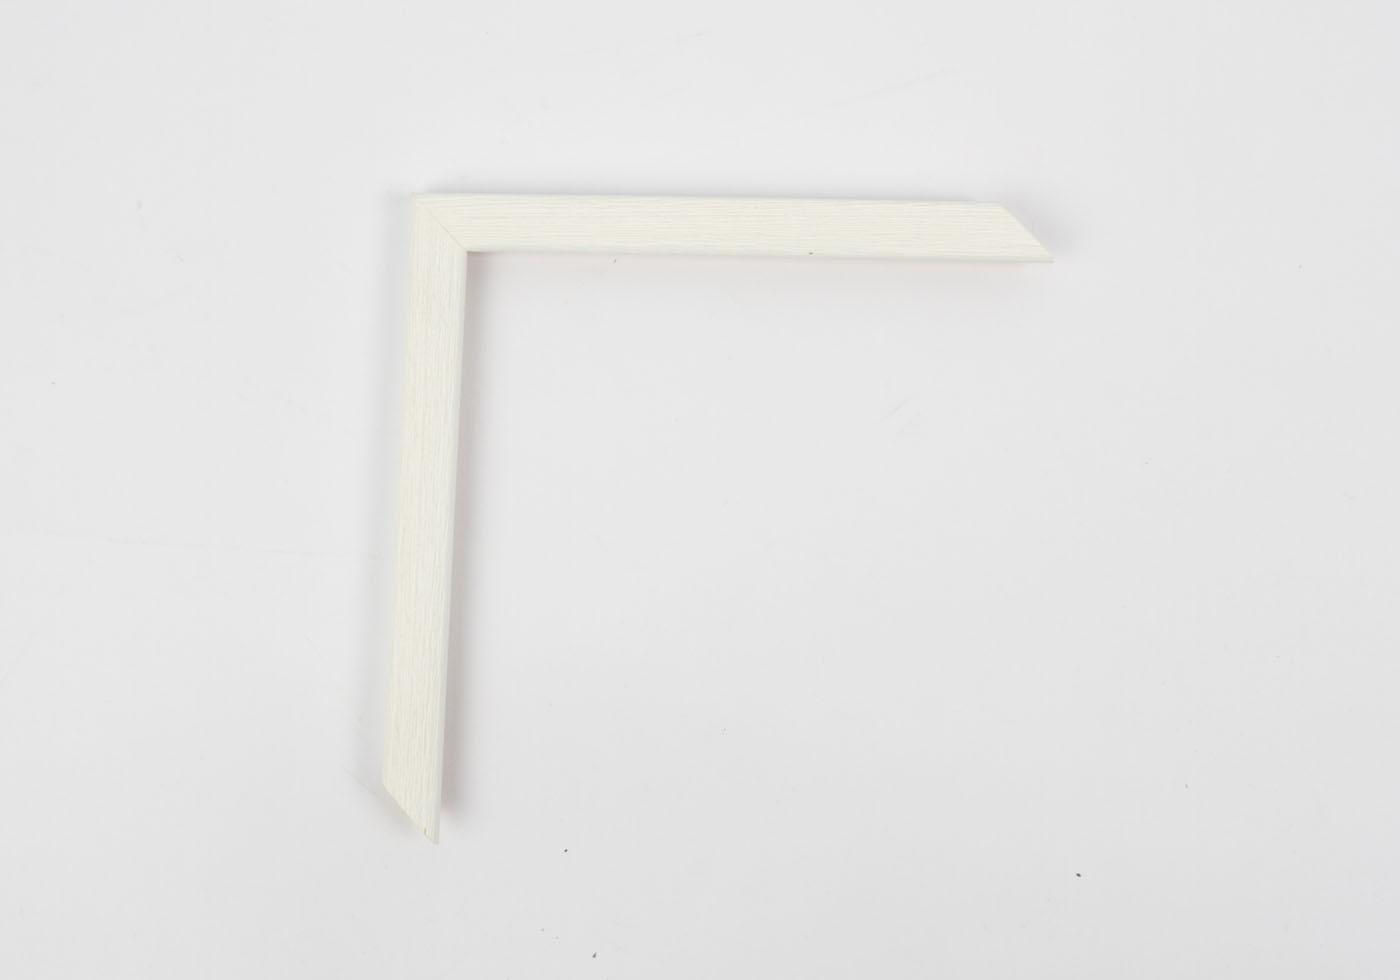 02036-BLANCO-ancho1,6cm